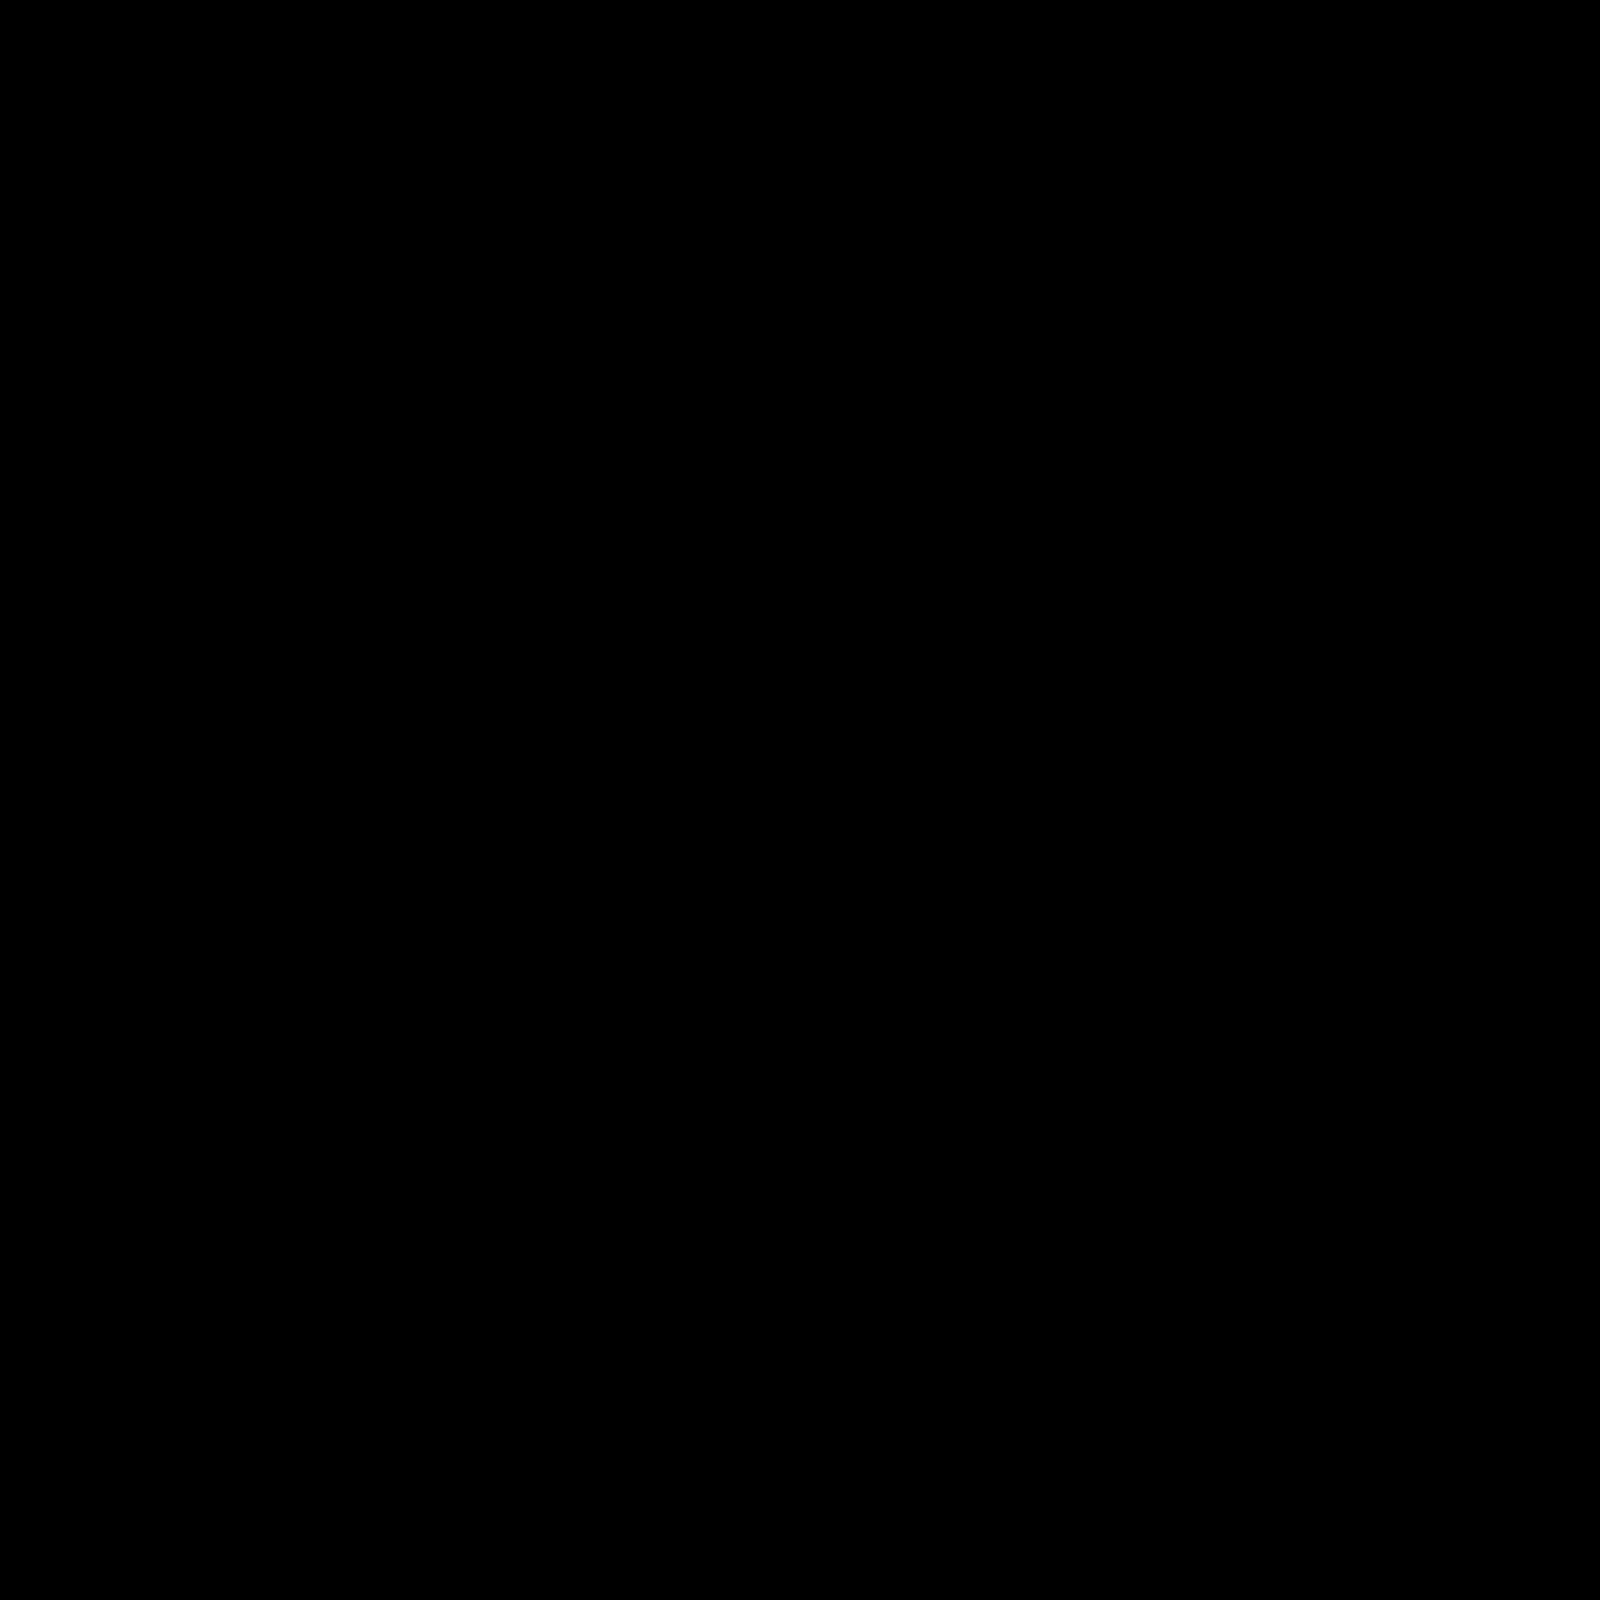 Pusty filtr icon